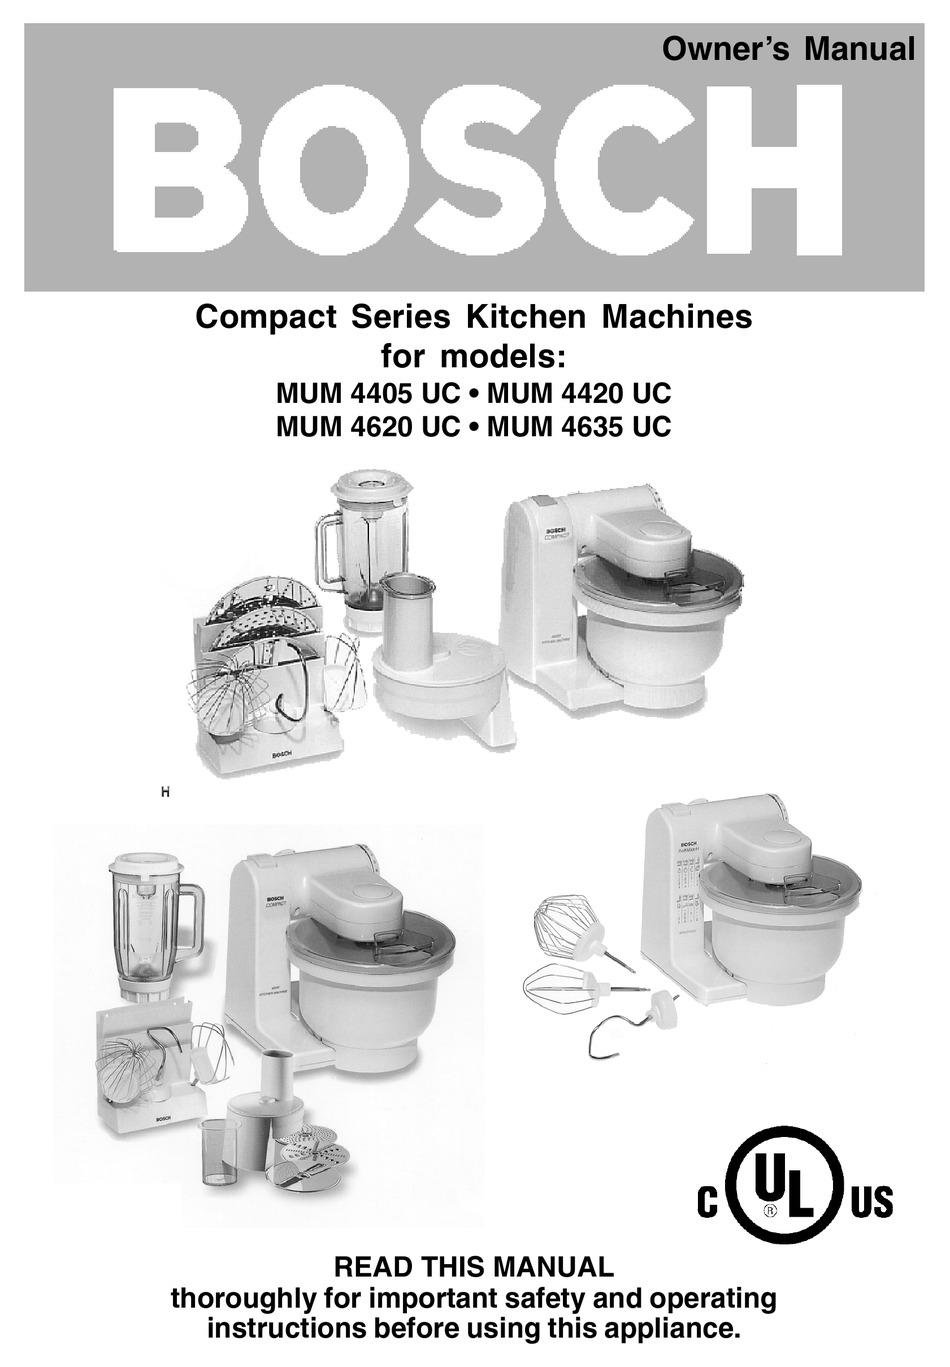 Bosch Mum 4420 Uc Owner S Manual Pdf Download Manualslib